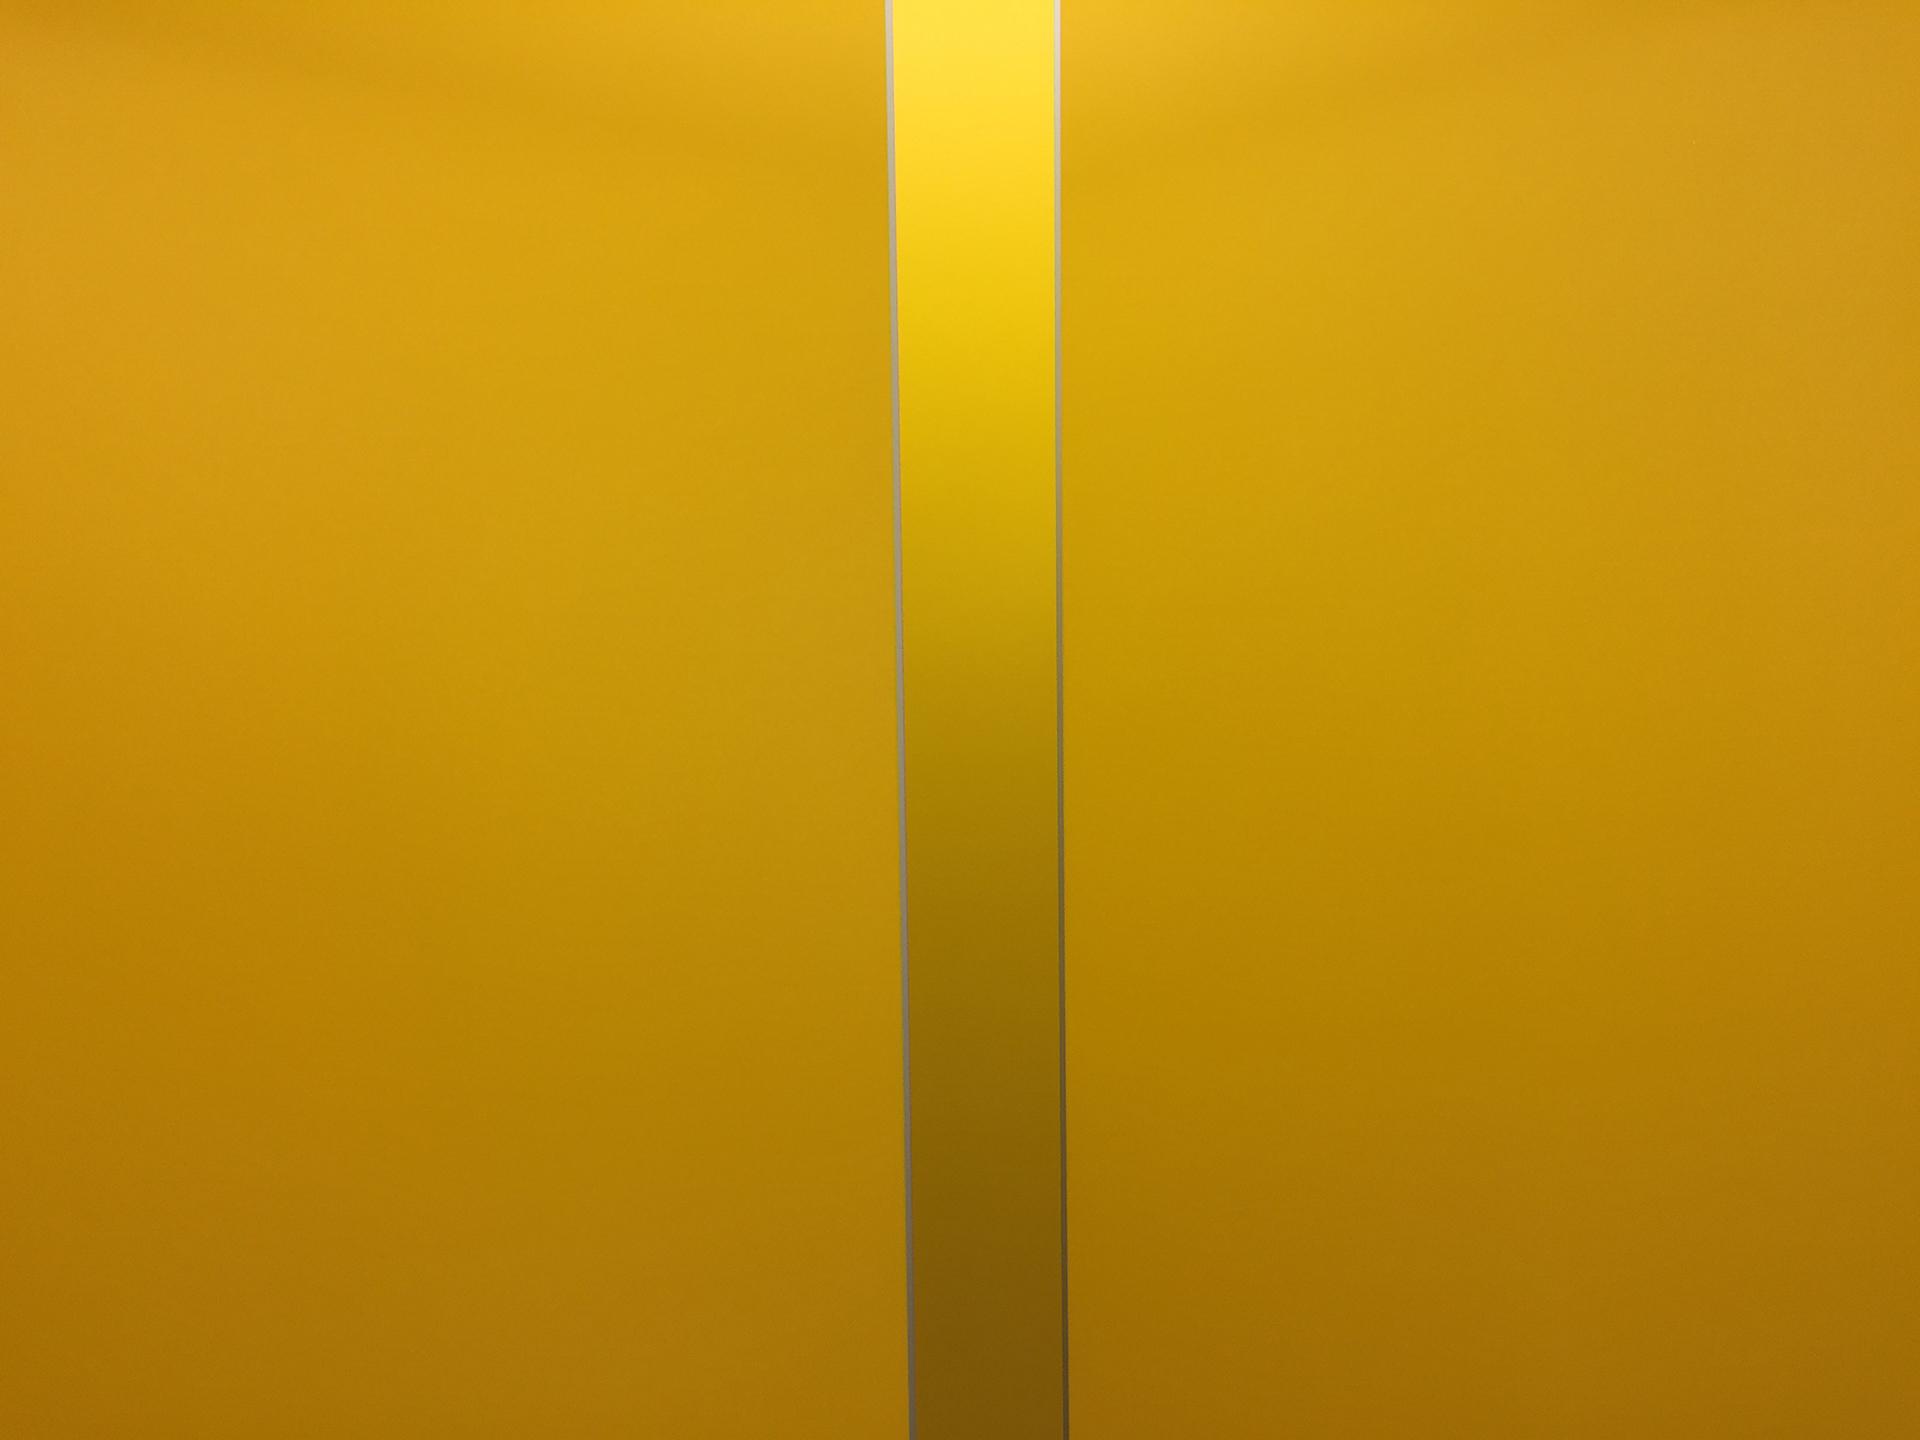 Mila-wall Wandmodule mit gelber Oberflächenfolie